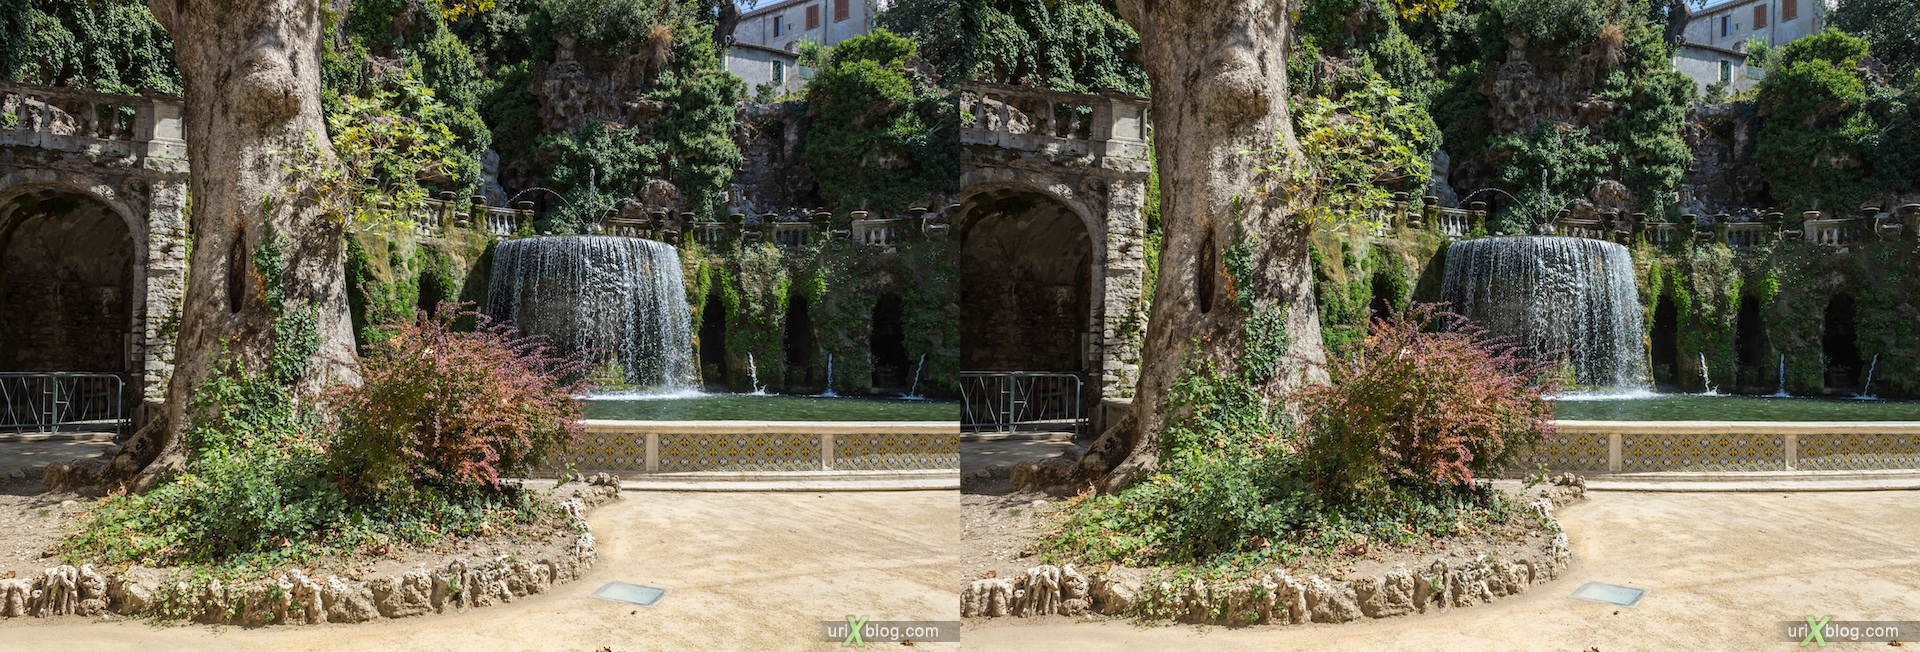 2012, Oval fountain, Fontana dell'Ovato, villa D'Este, Italy, Tivoli, Rome, 3D, stereo pair, cross-eyed, crossview, cross view stereo pair